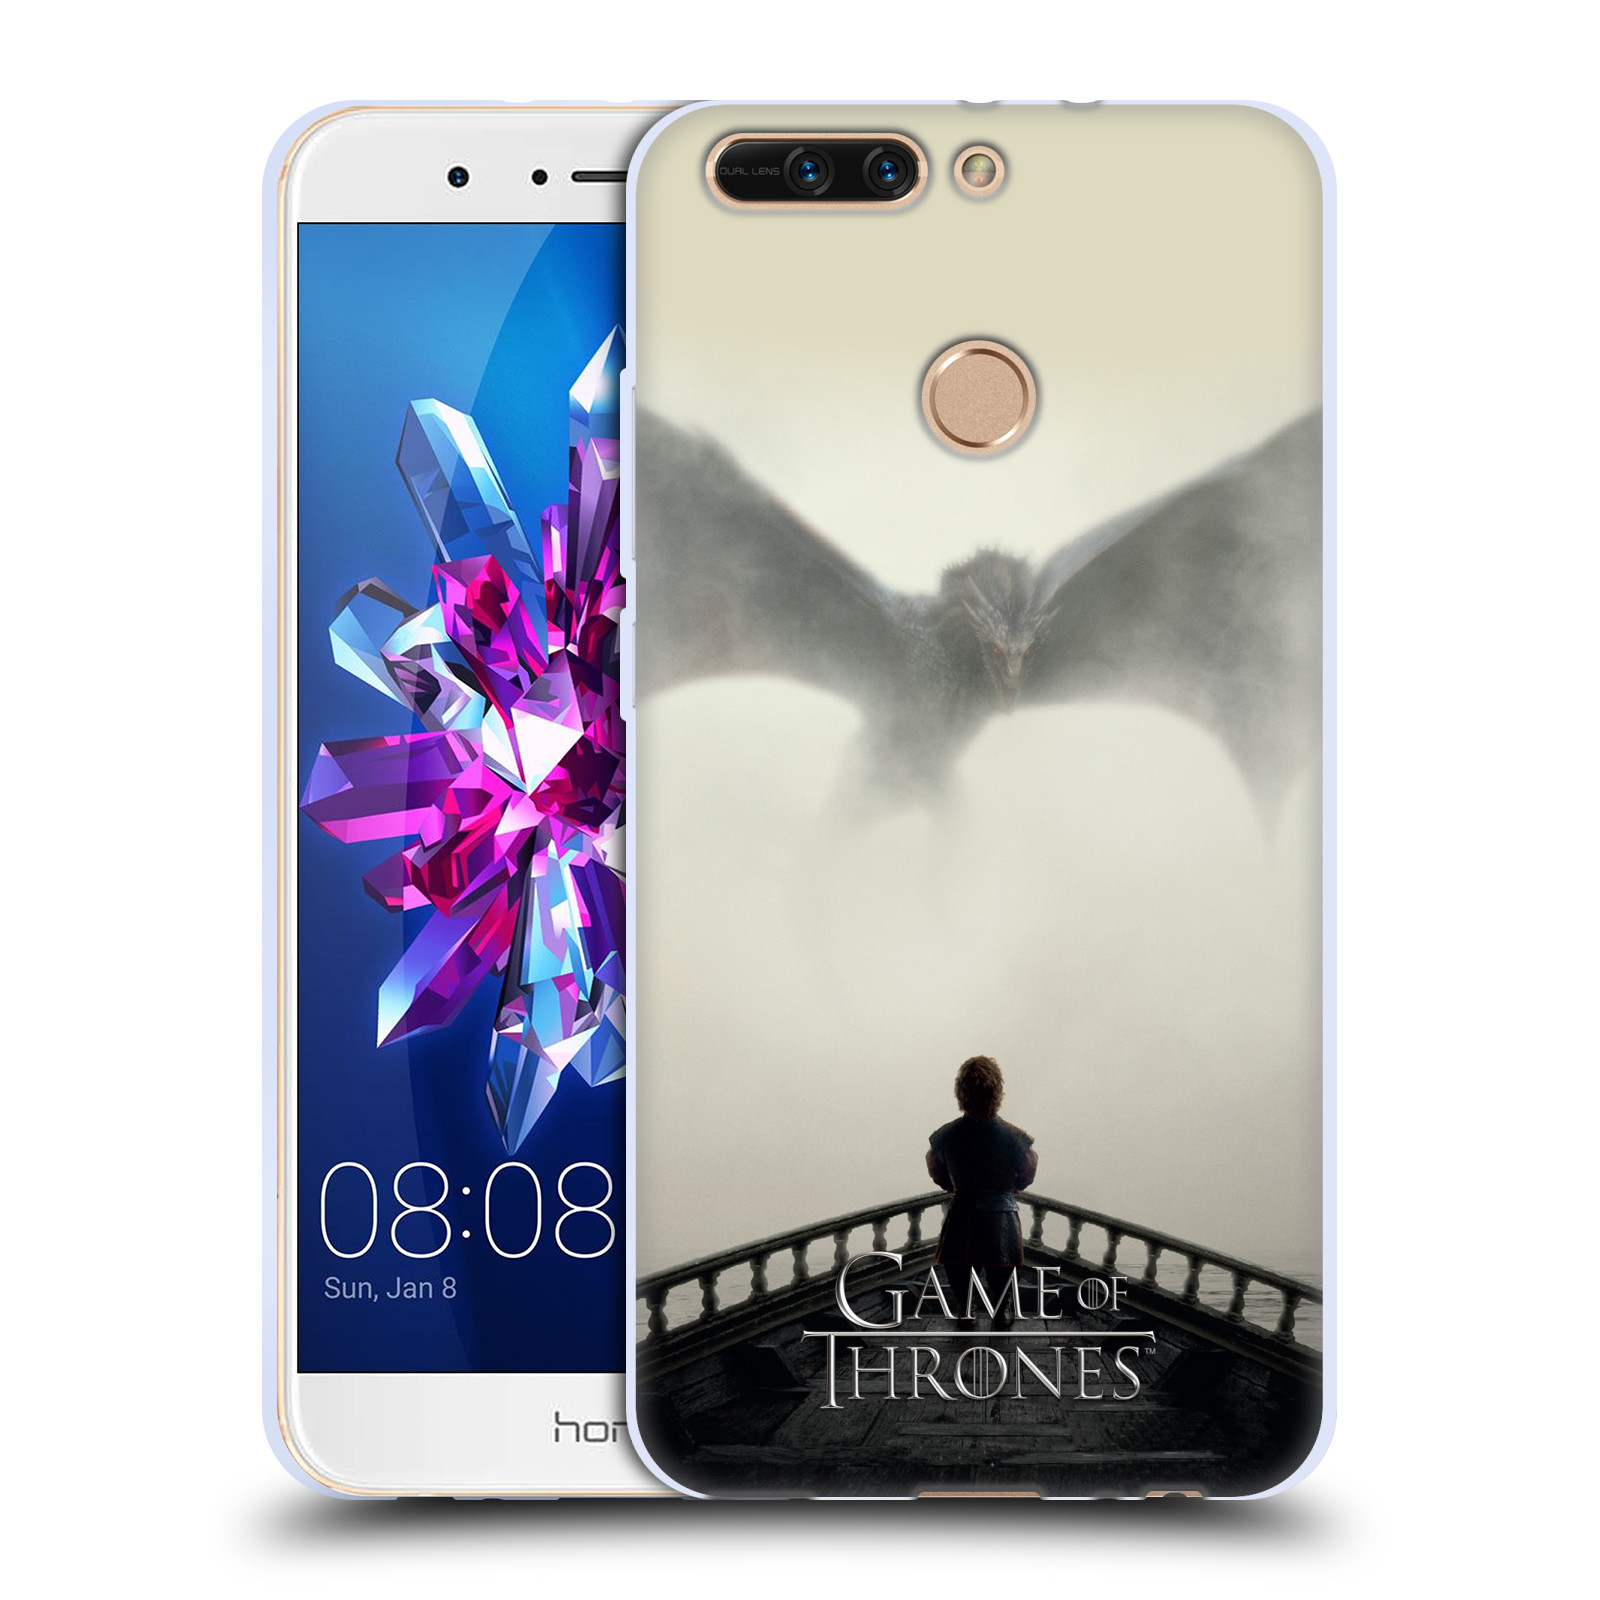 Silikonové pouzdro na mobil Honor 8 Pro - Head Case - Hra o trůny - Vengeance